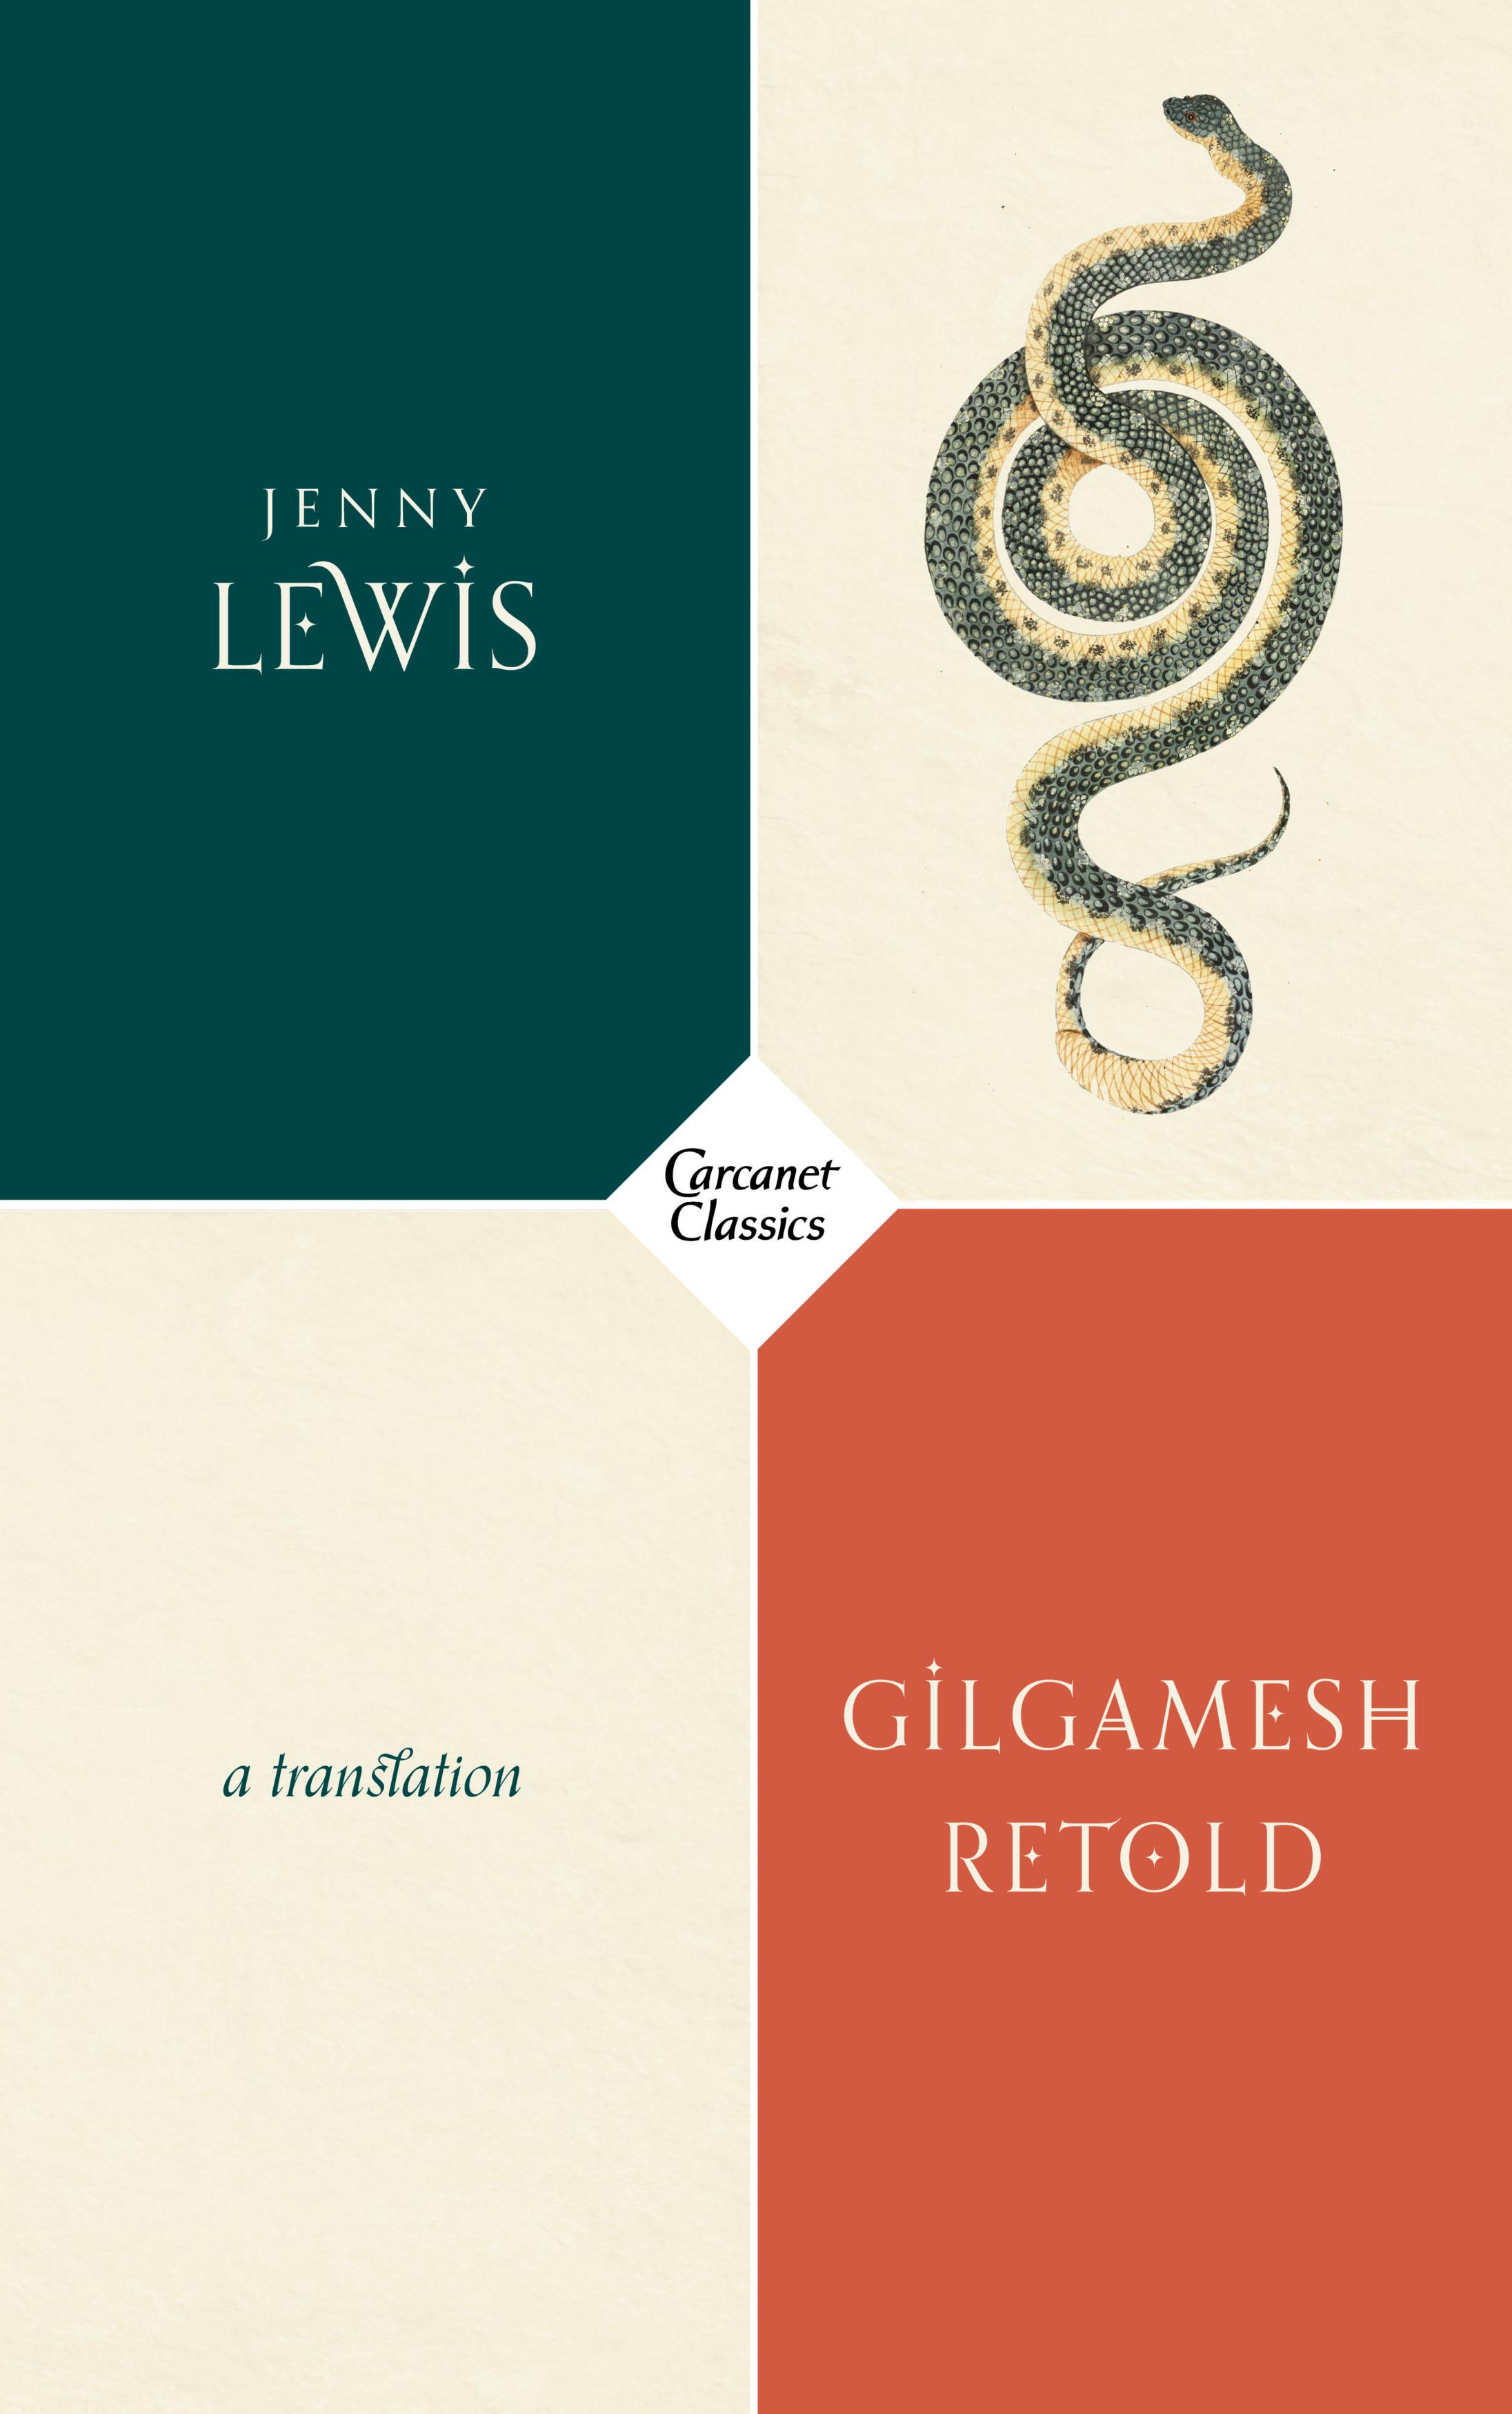 GILGAMESH, Lewis fcp